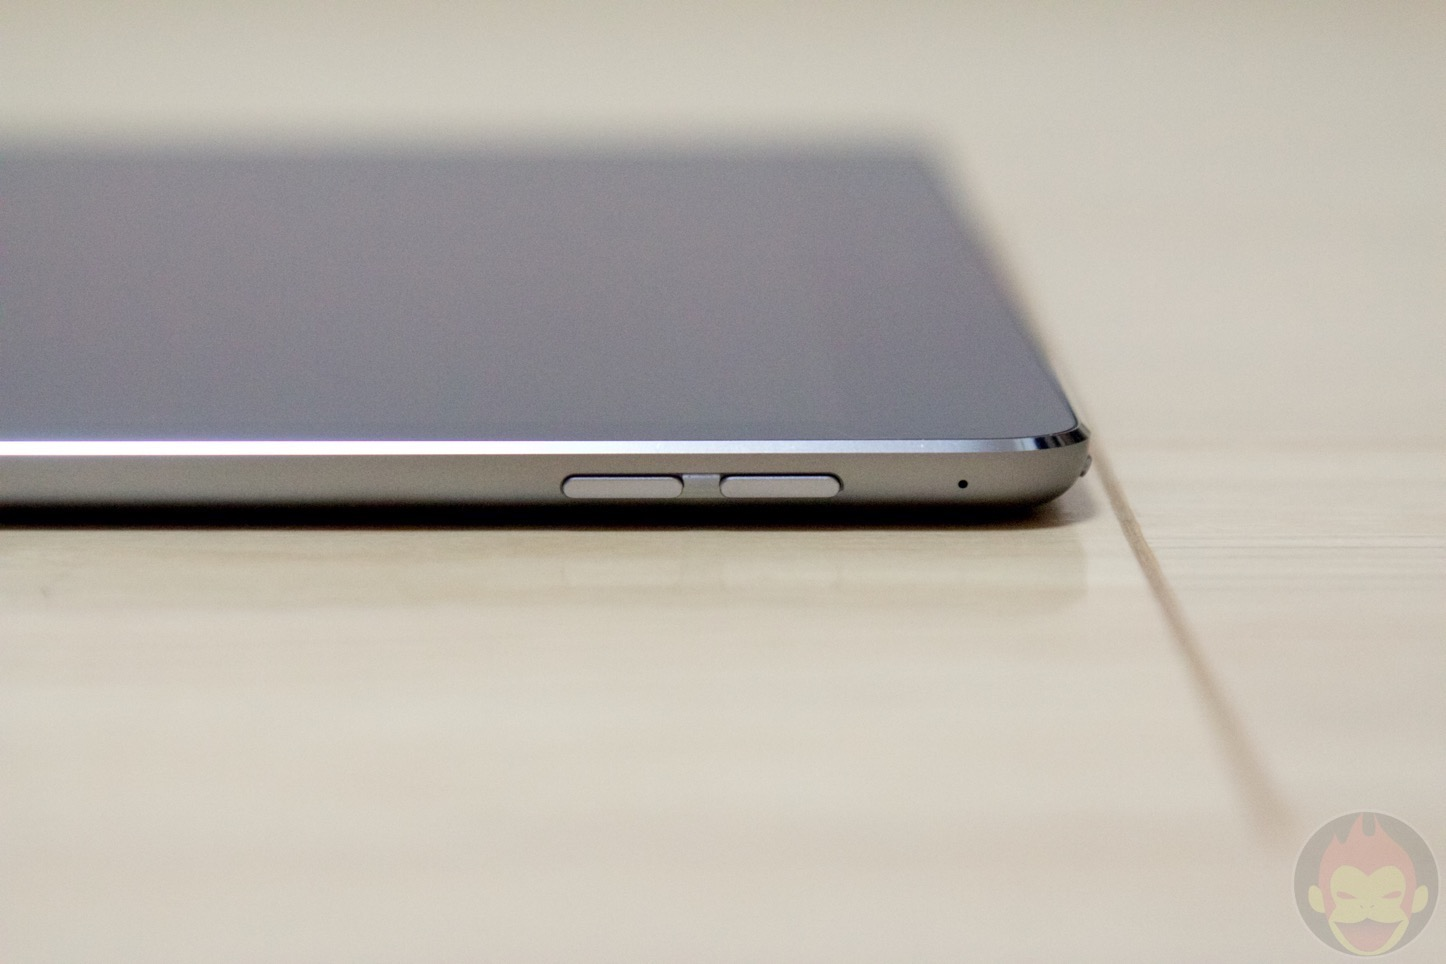 iPad-Pro-Unboxing-10.jpg